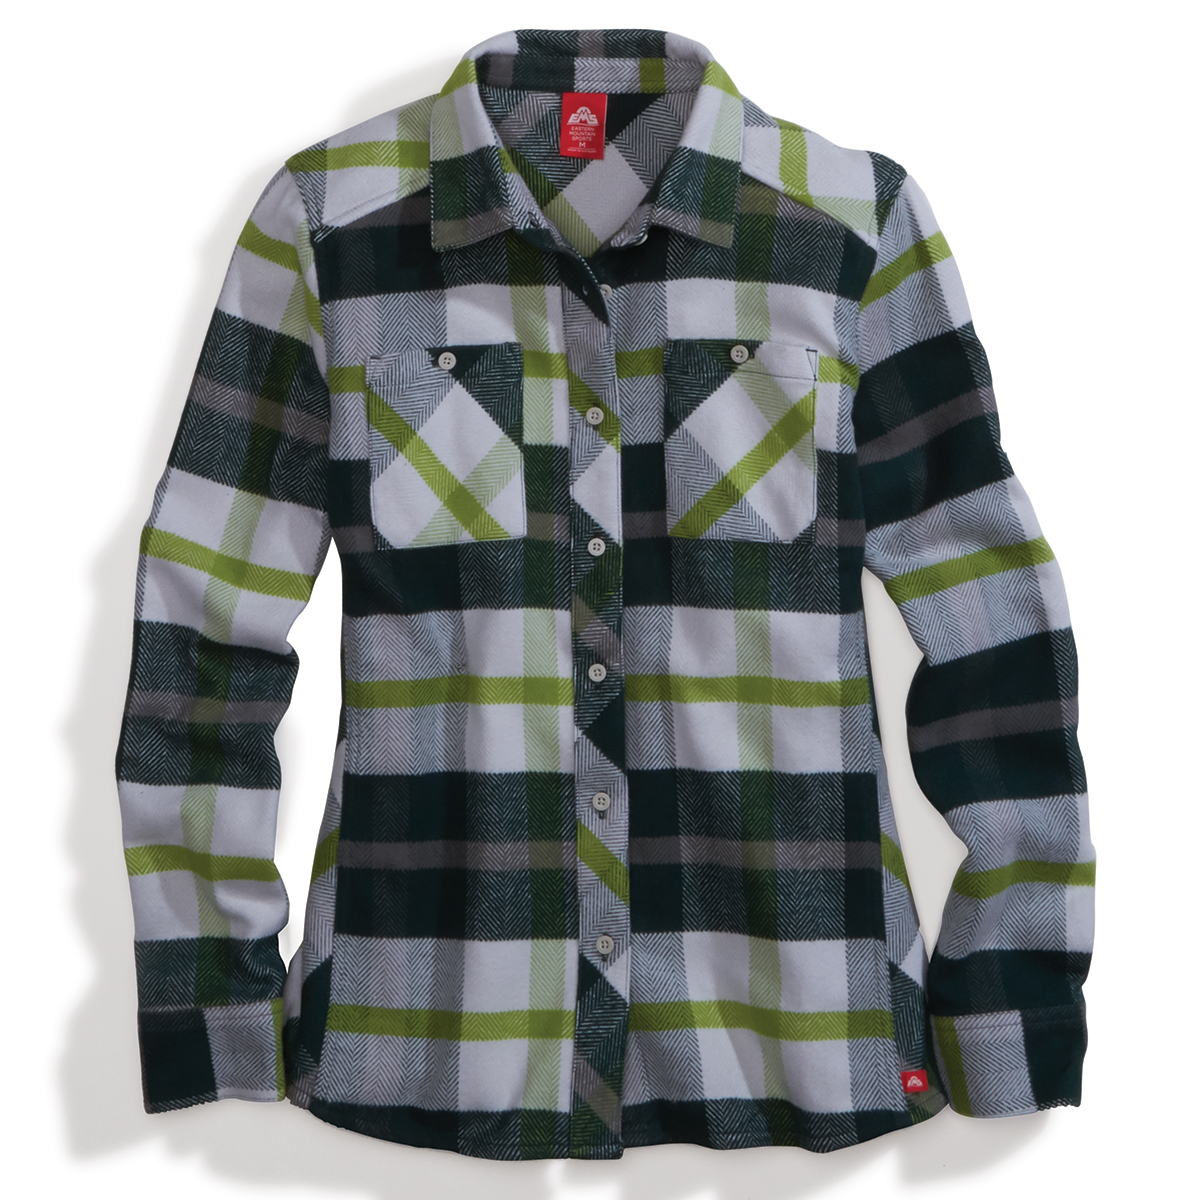 Ems Women's Cabin Flannel - Green, XL